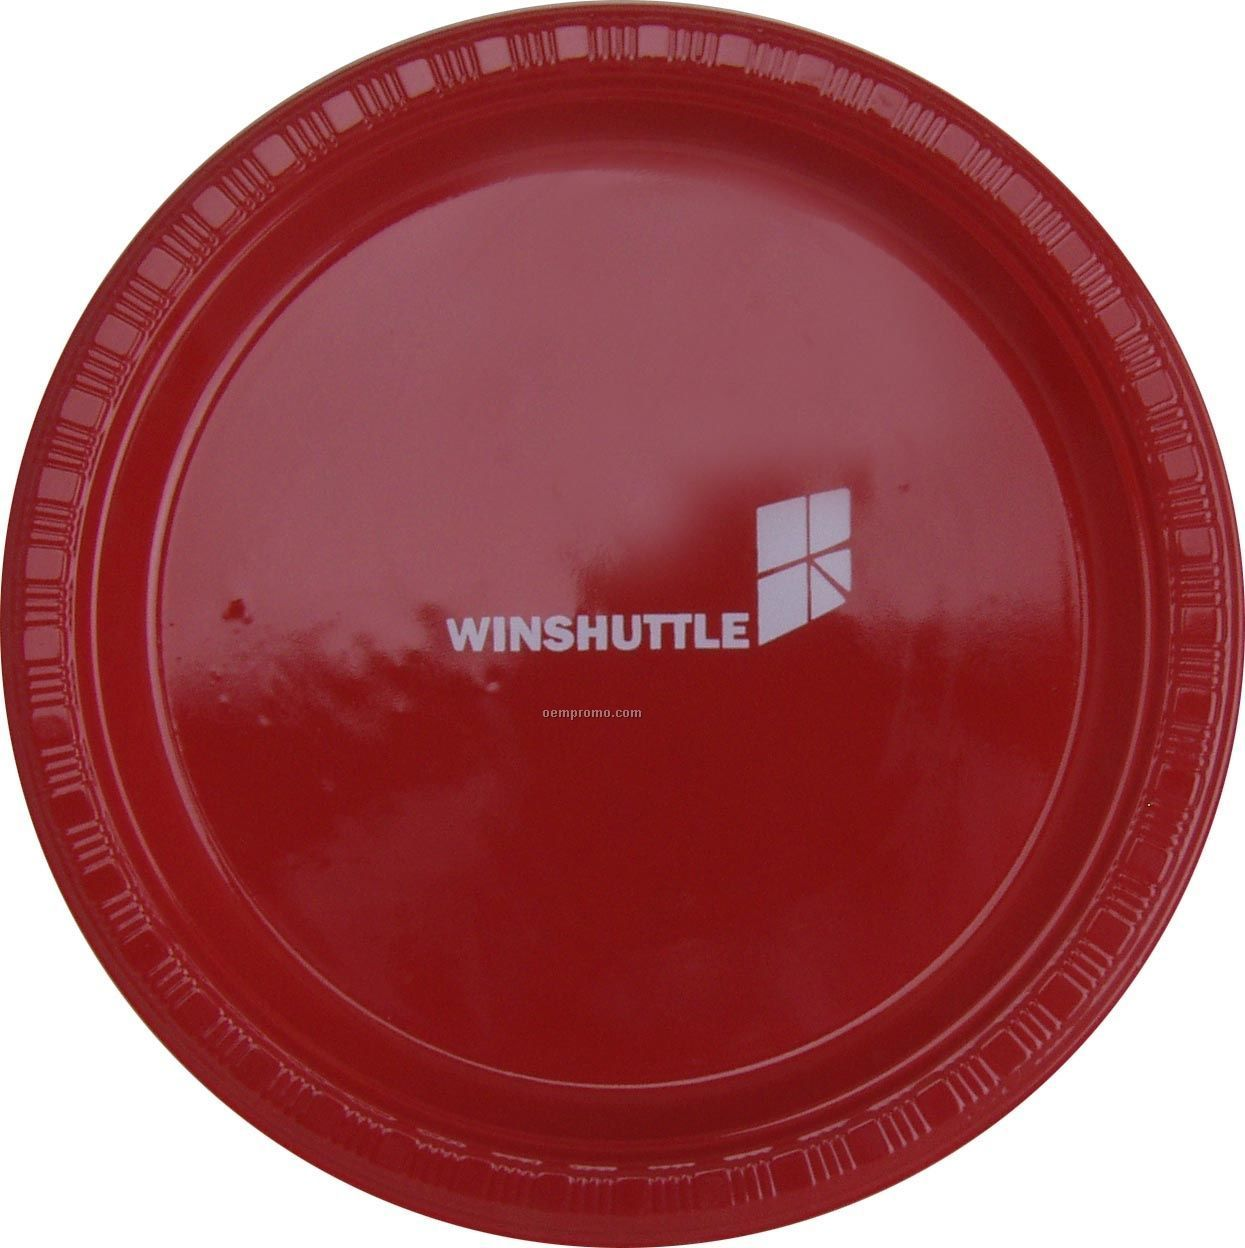 "Colorware 9"" Classic Red Plastic Plate"